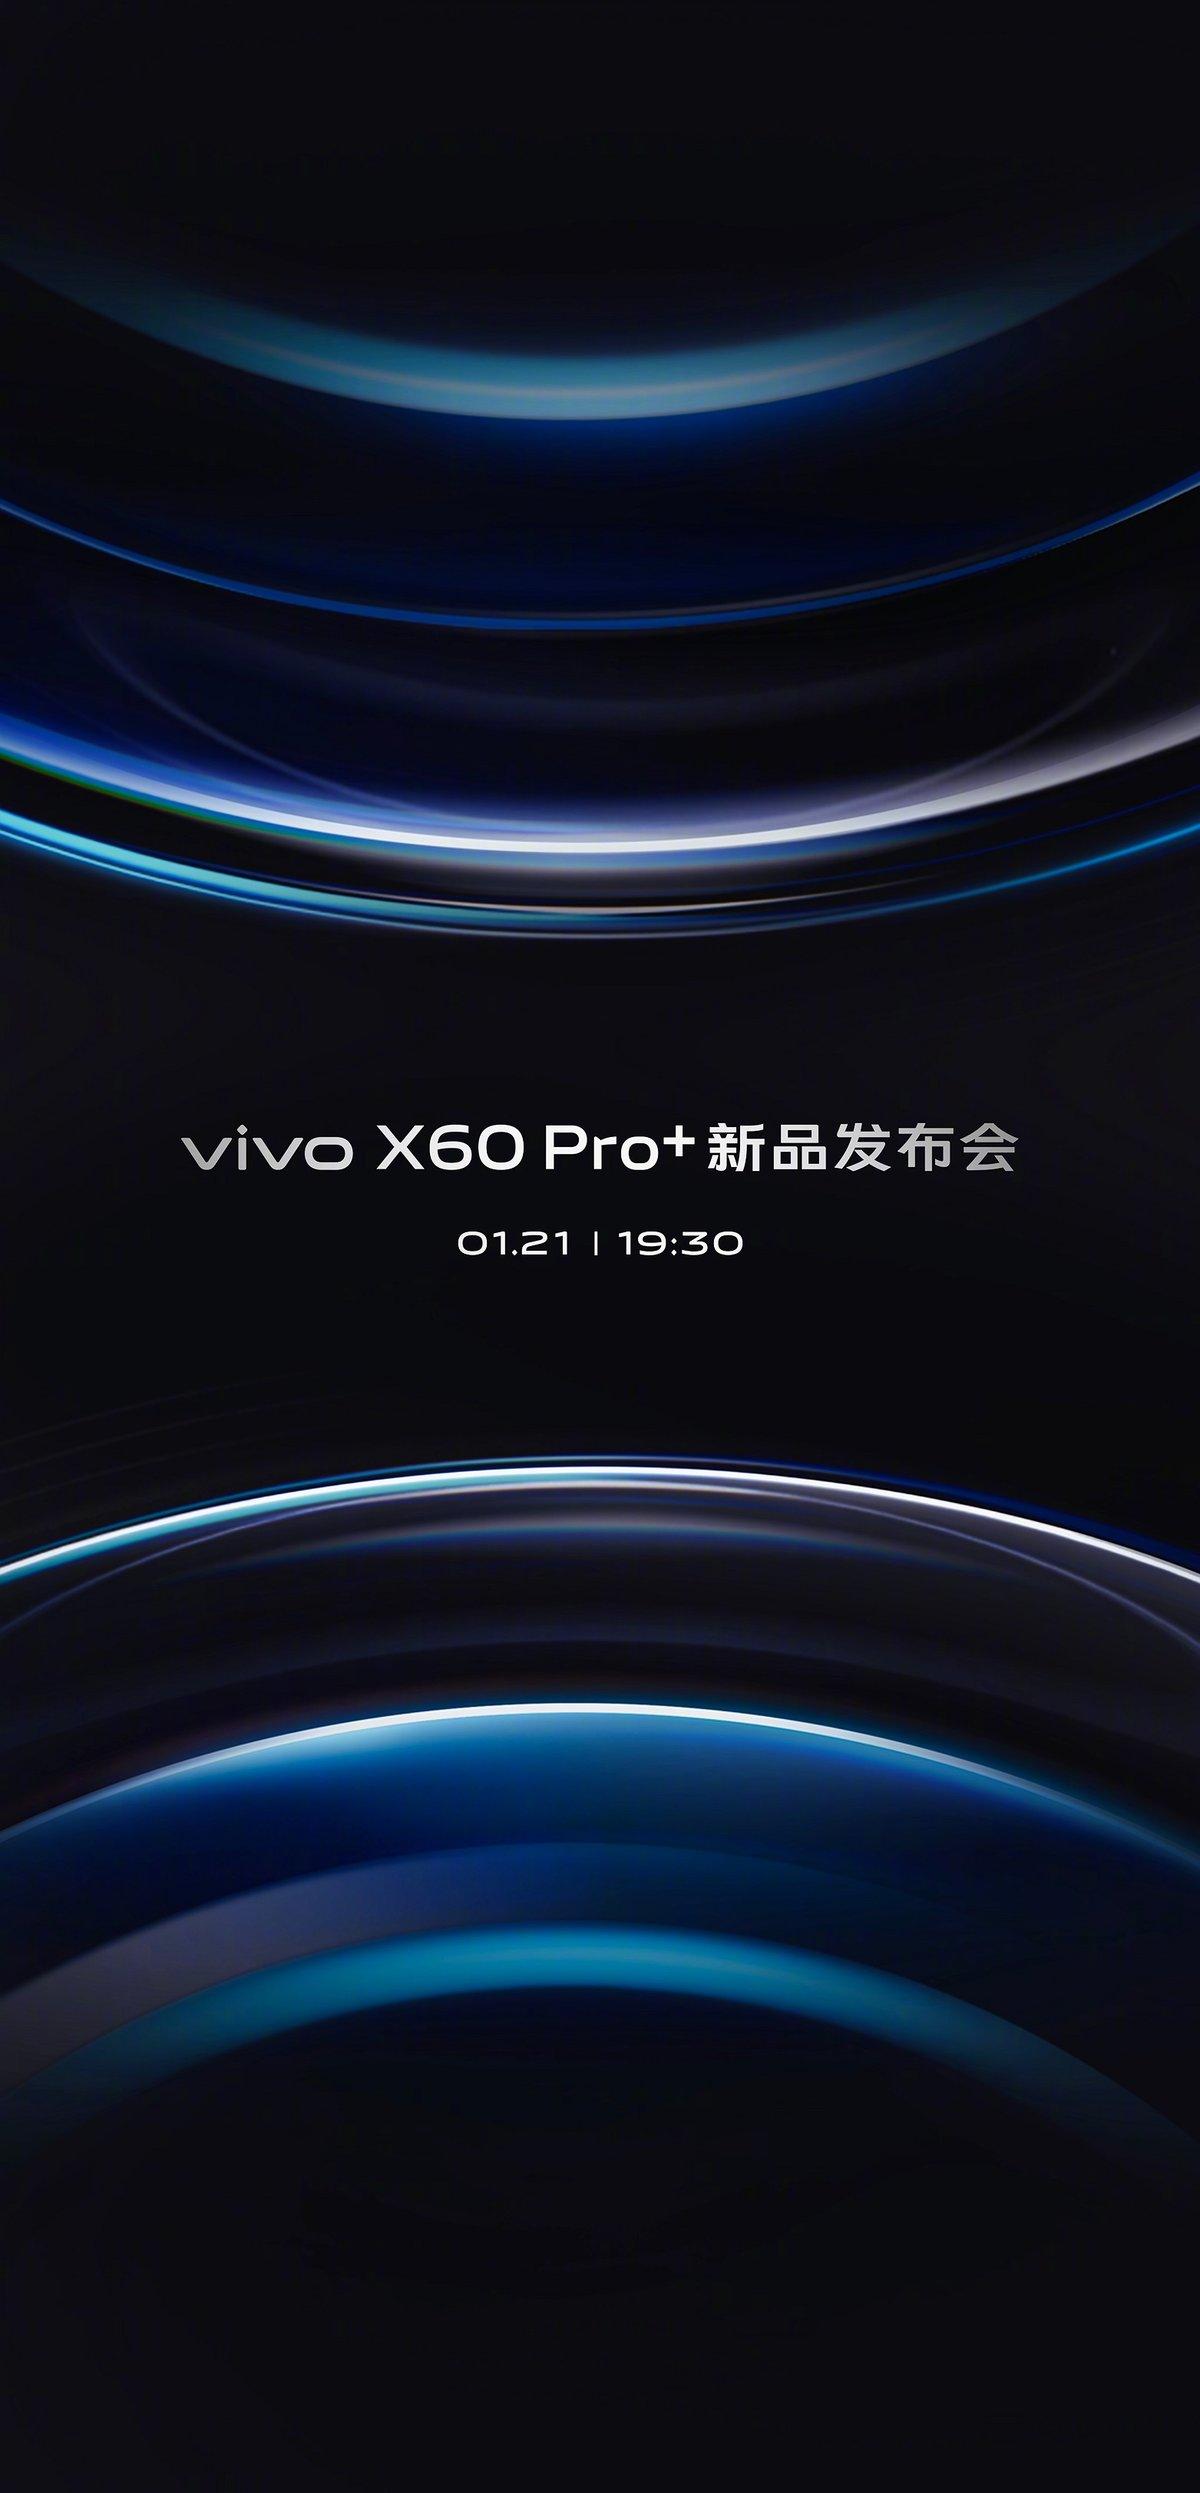 vivo X60 Pro+ 背部设计公布:搭载超感光微云台双主摄 - 热点资讯 家电百科 第3张